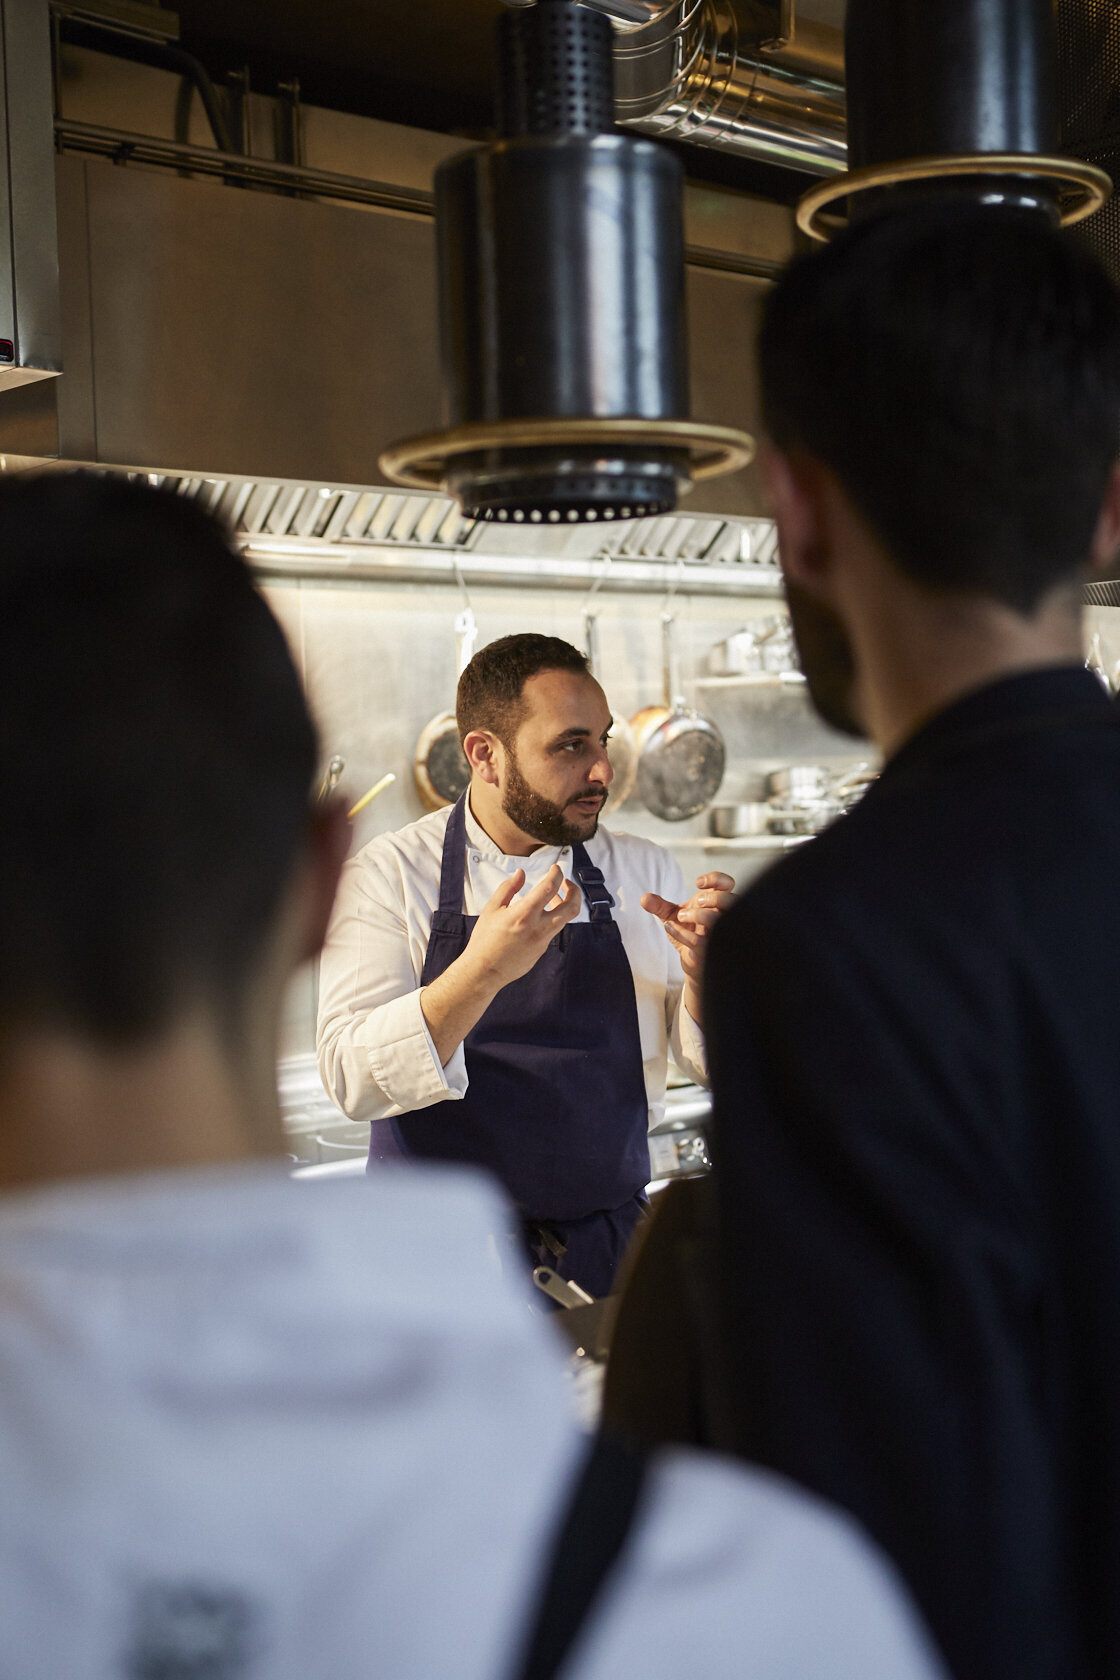 coal-office-tom-dixon-assaf-granit-kings-cross-london-restaurant-foodie-food-foodporn-realfood-israeli-chef-kitchen-reportage-documentary-foodphotographerlondon-food-photographer